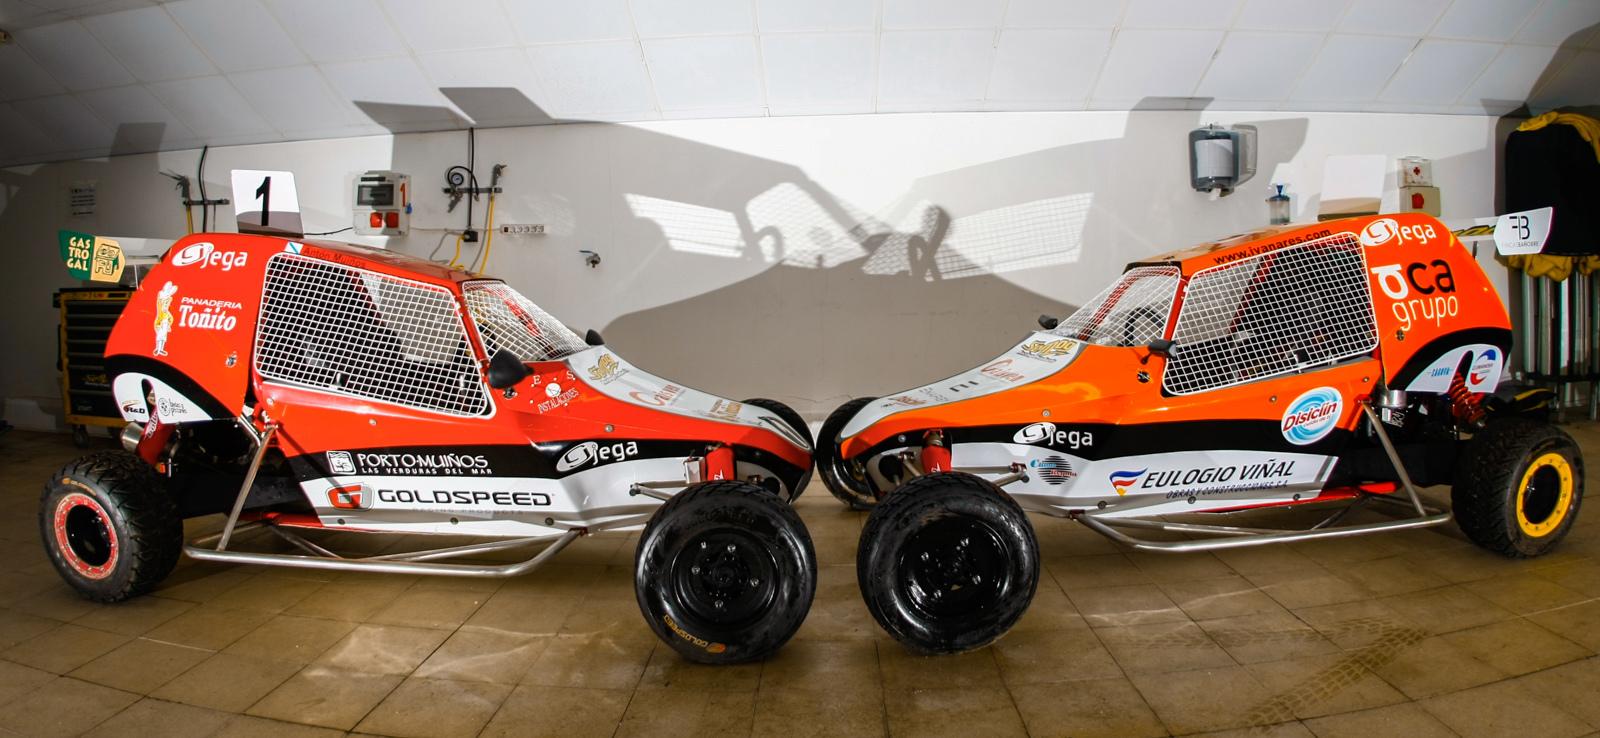 001_kartcross_003